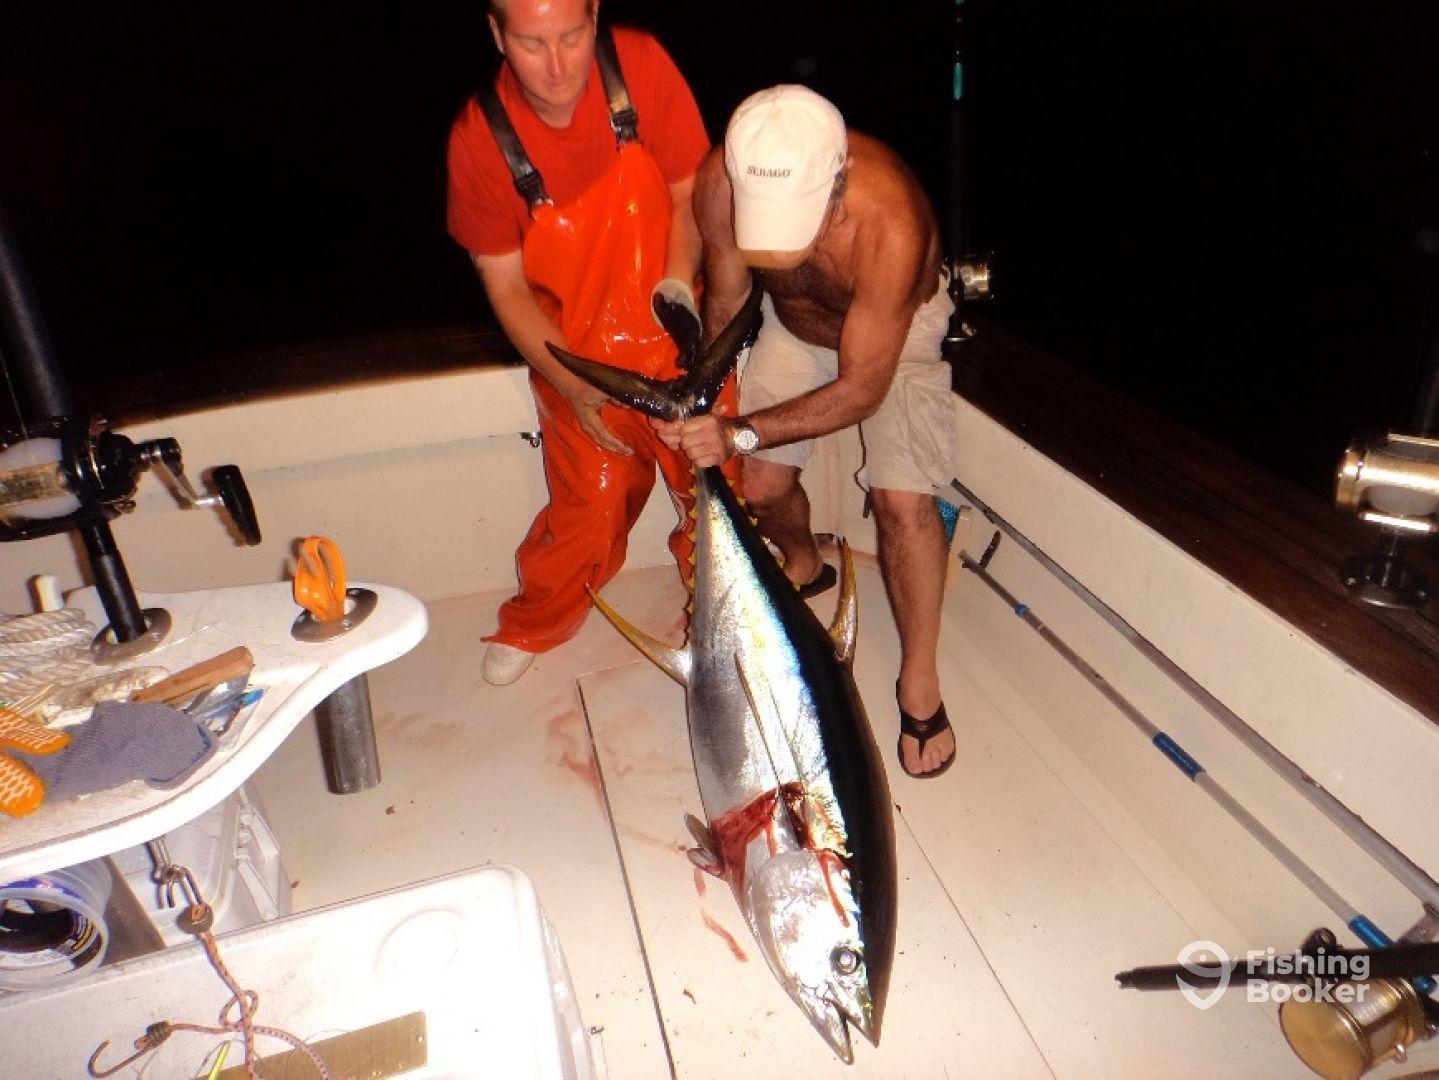 yellowfin tuna 80 lb class